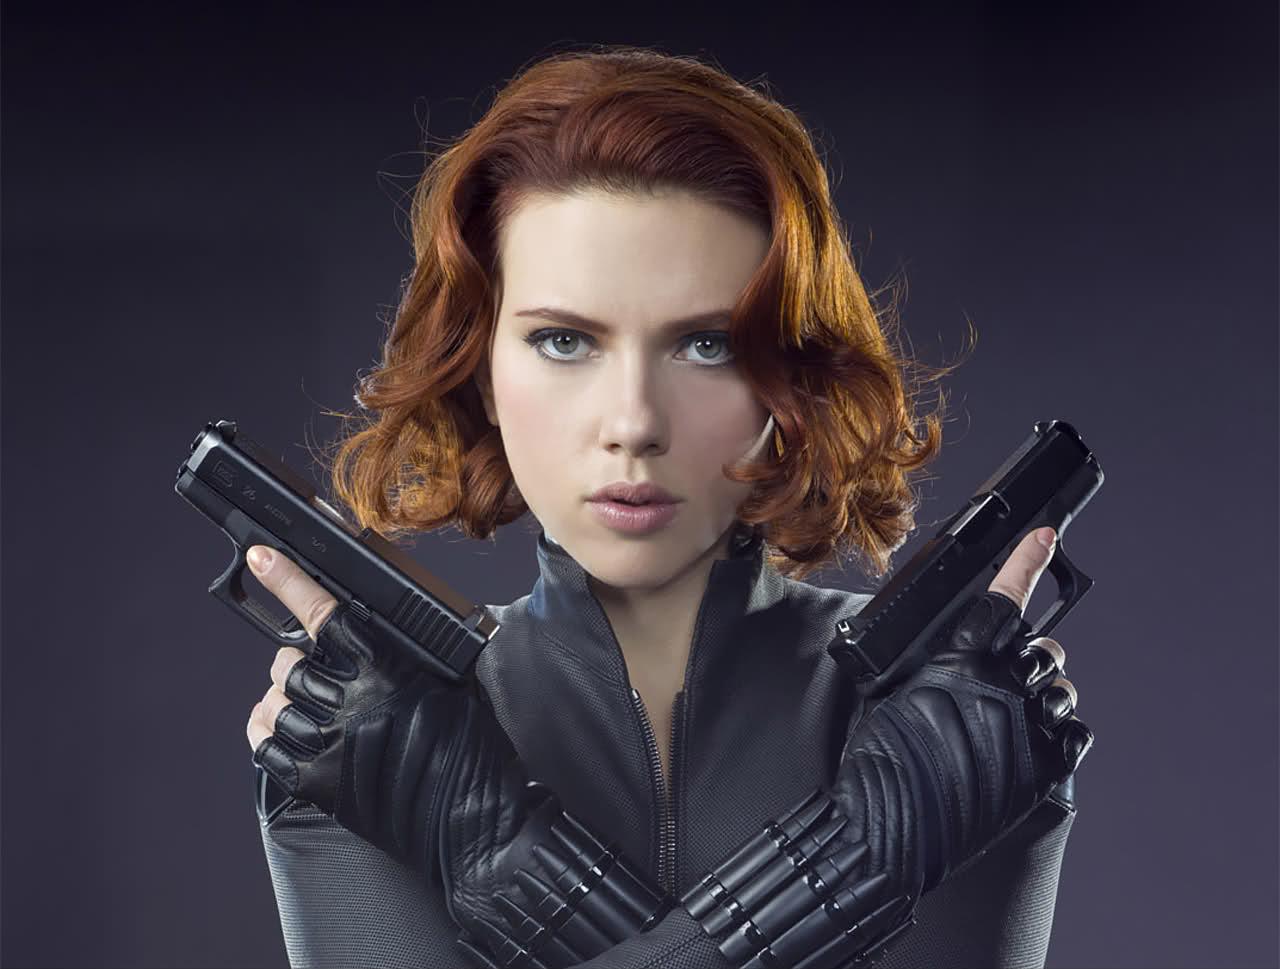 http://img3.wikia.nocookie.net/__cb20120518120123/marvelmovies/images/1/11/Avengers_Black_Widow.jpg